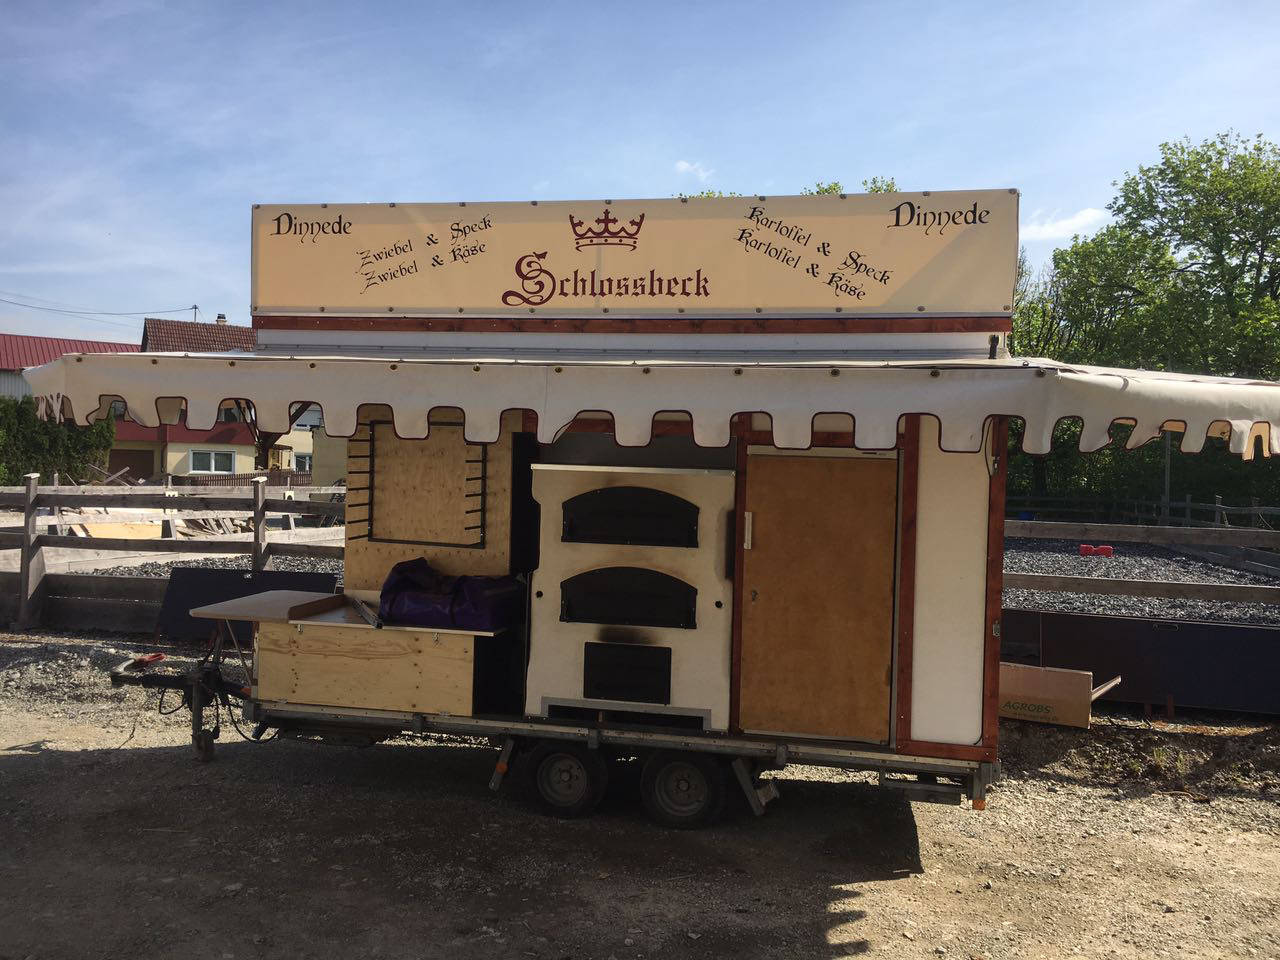 Partyhänger – Schlossbeck